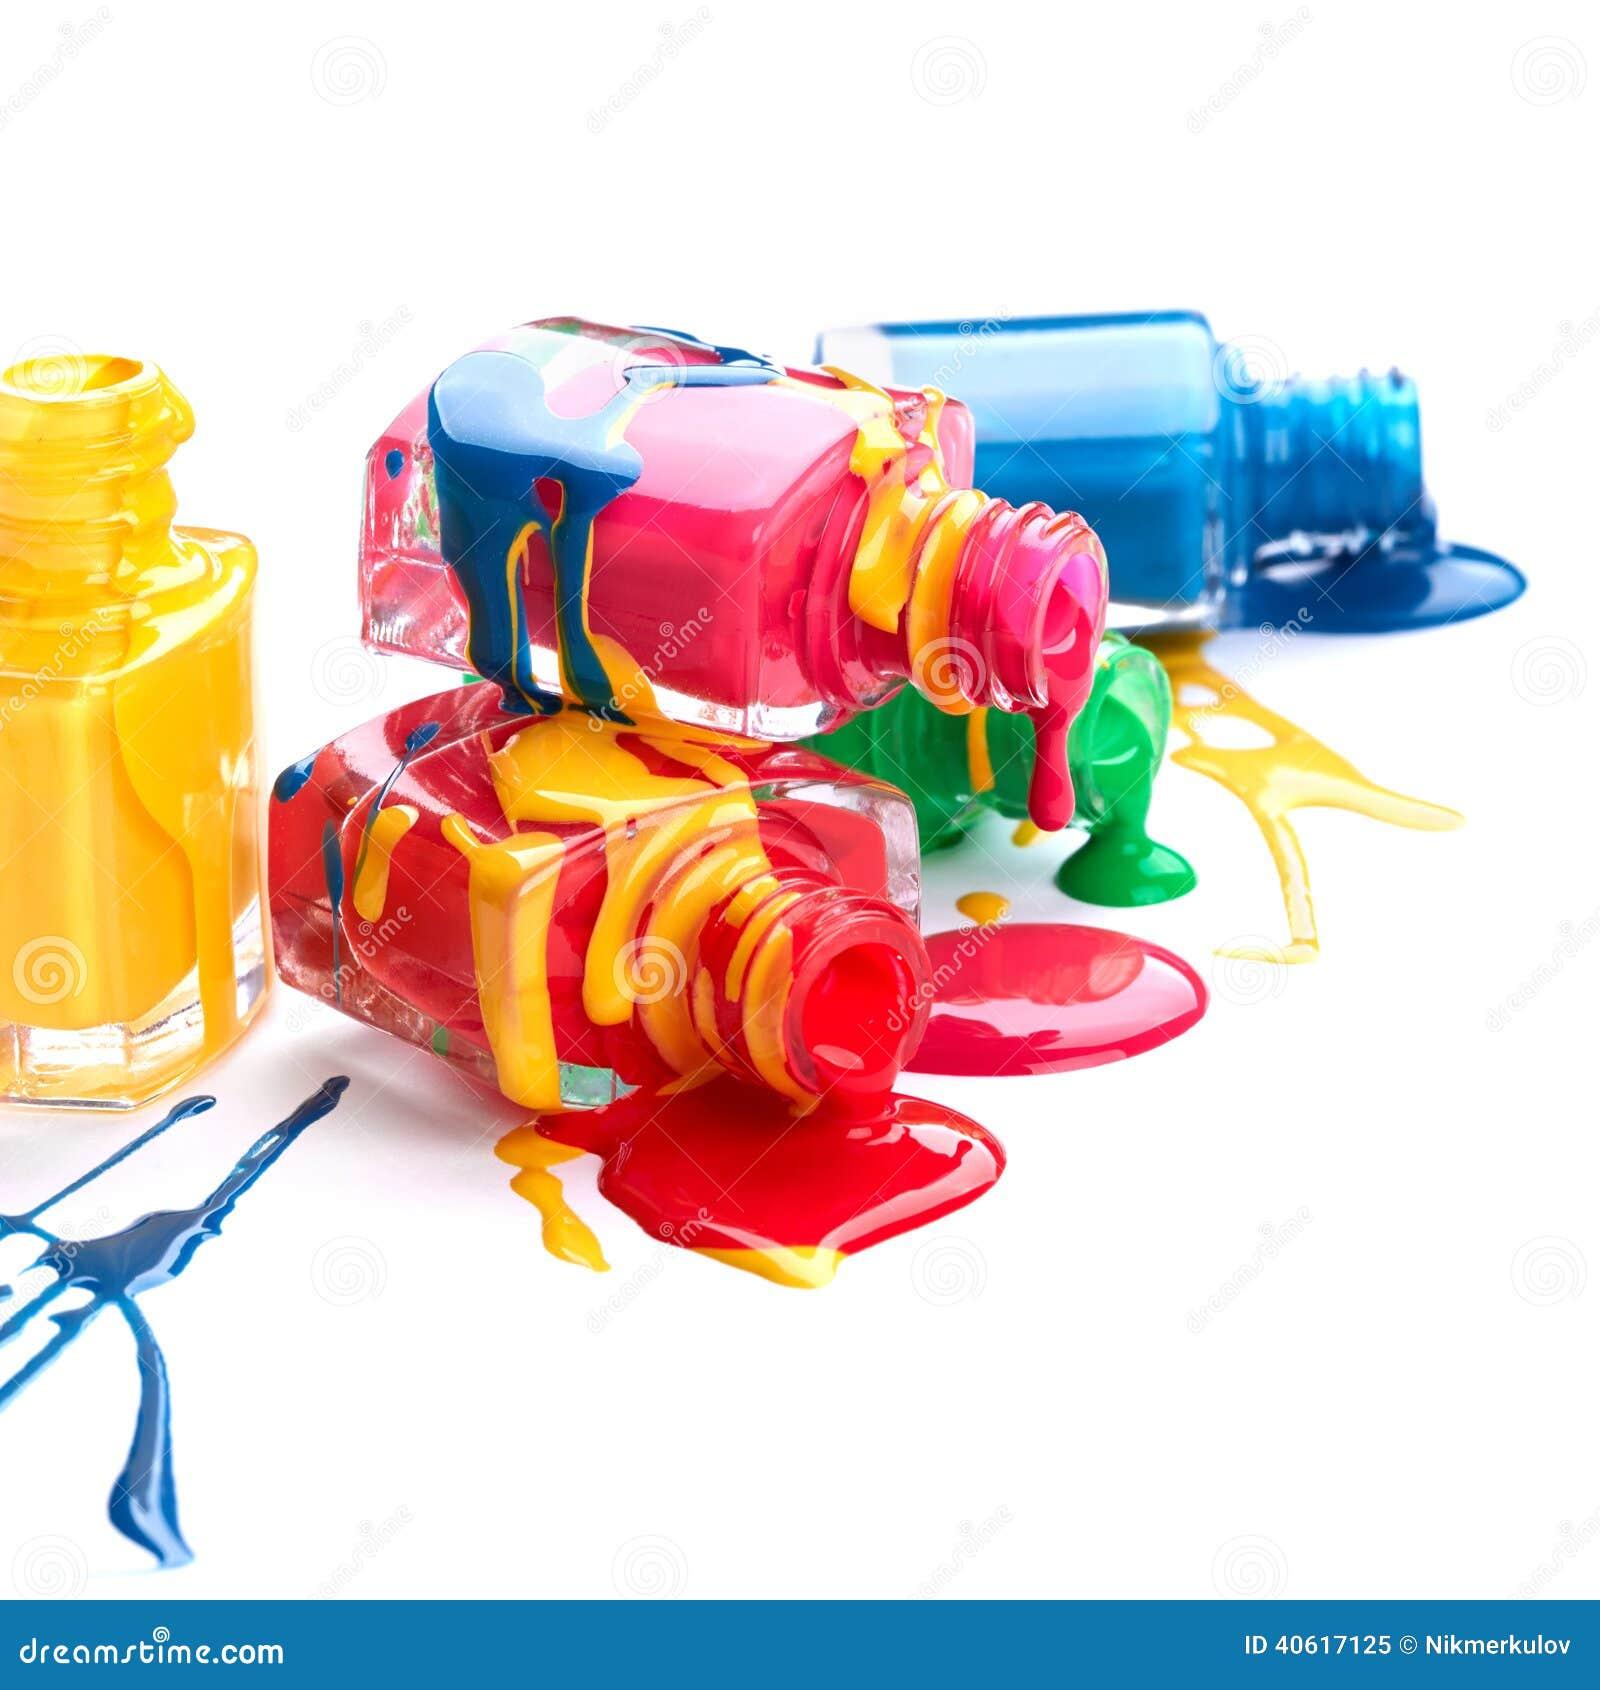 Spilled Nail Polish: Bottles With Spilled Nail Polish Stock Image